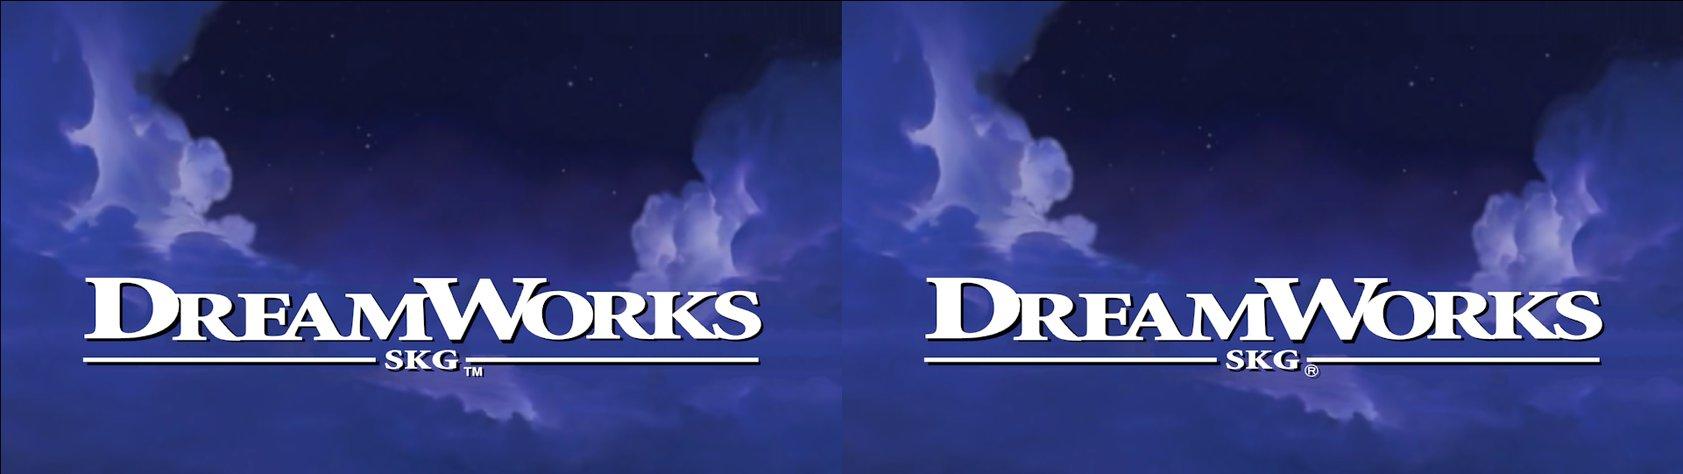 dreamworks skg logos